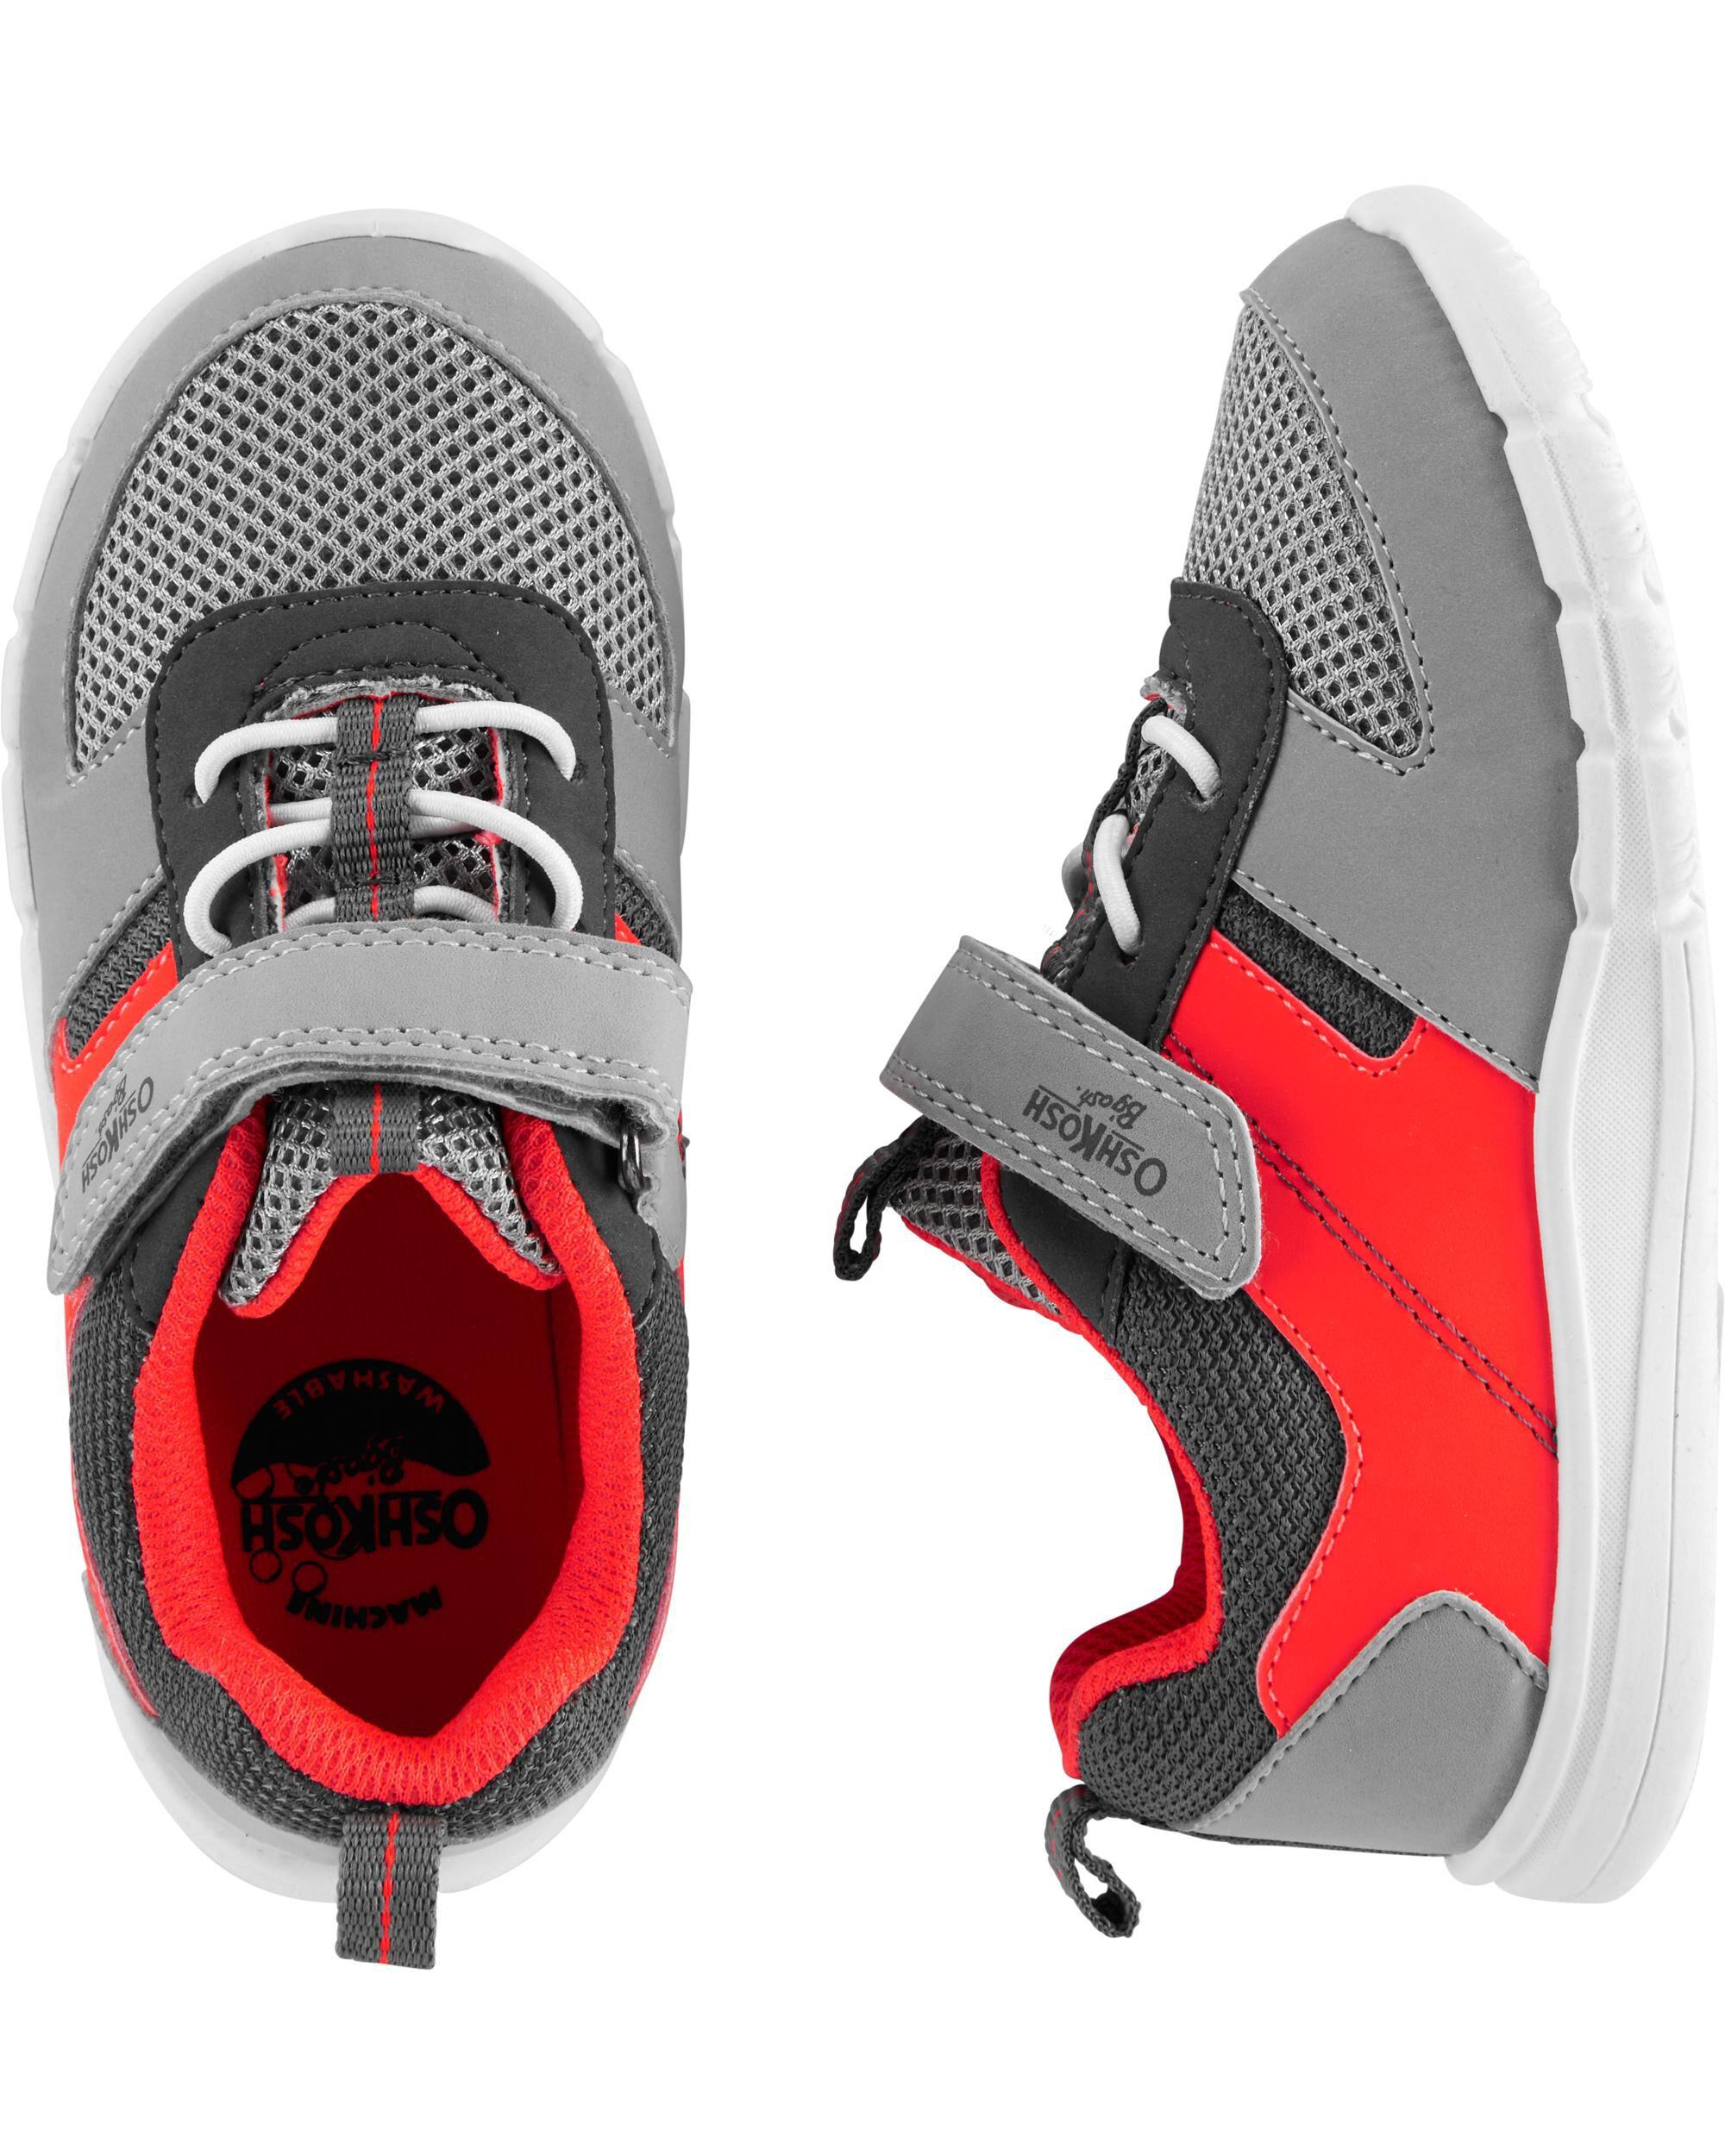 OshKosh Athletic Sneakers   oshkosh.com